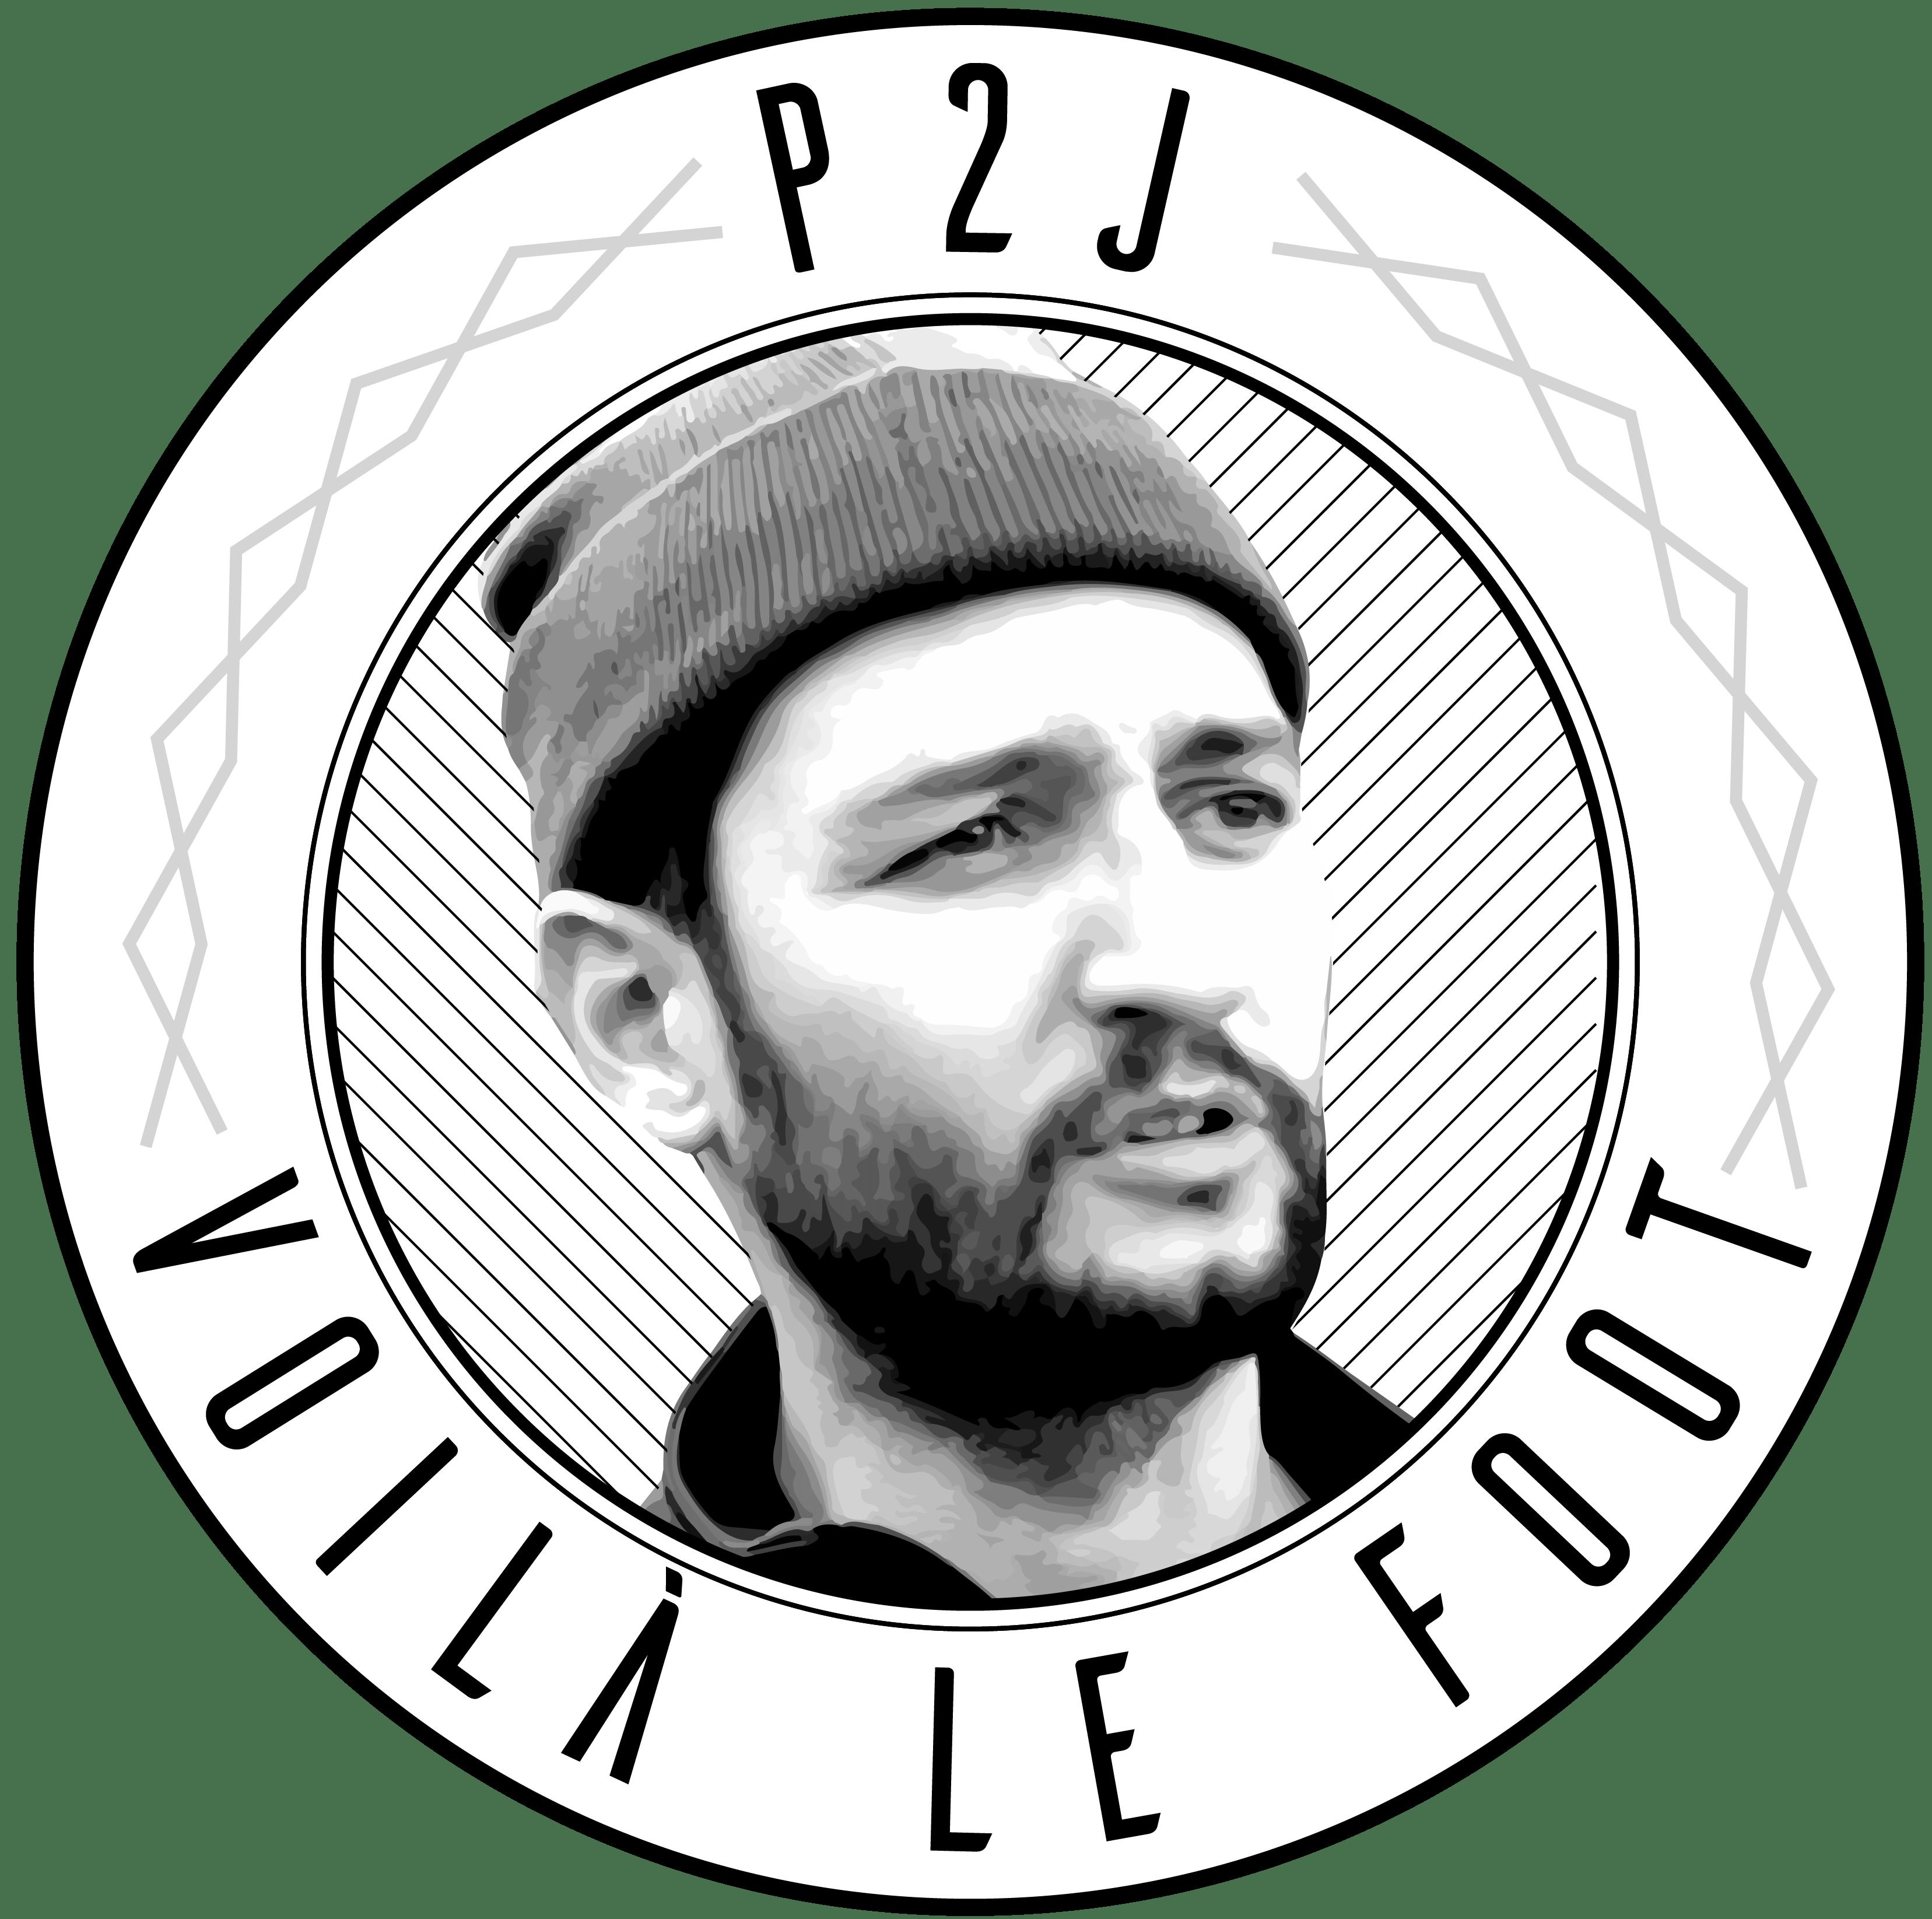 p2j-voila-foot